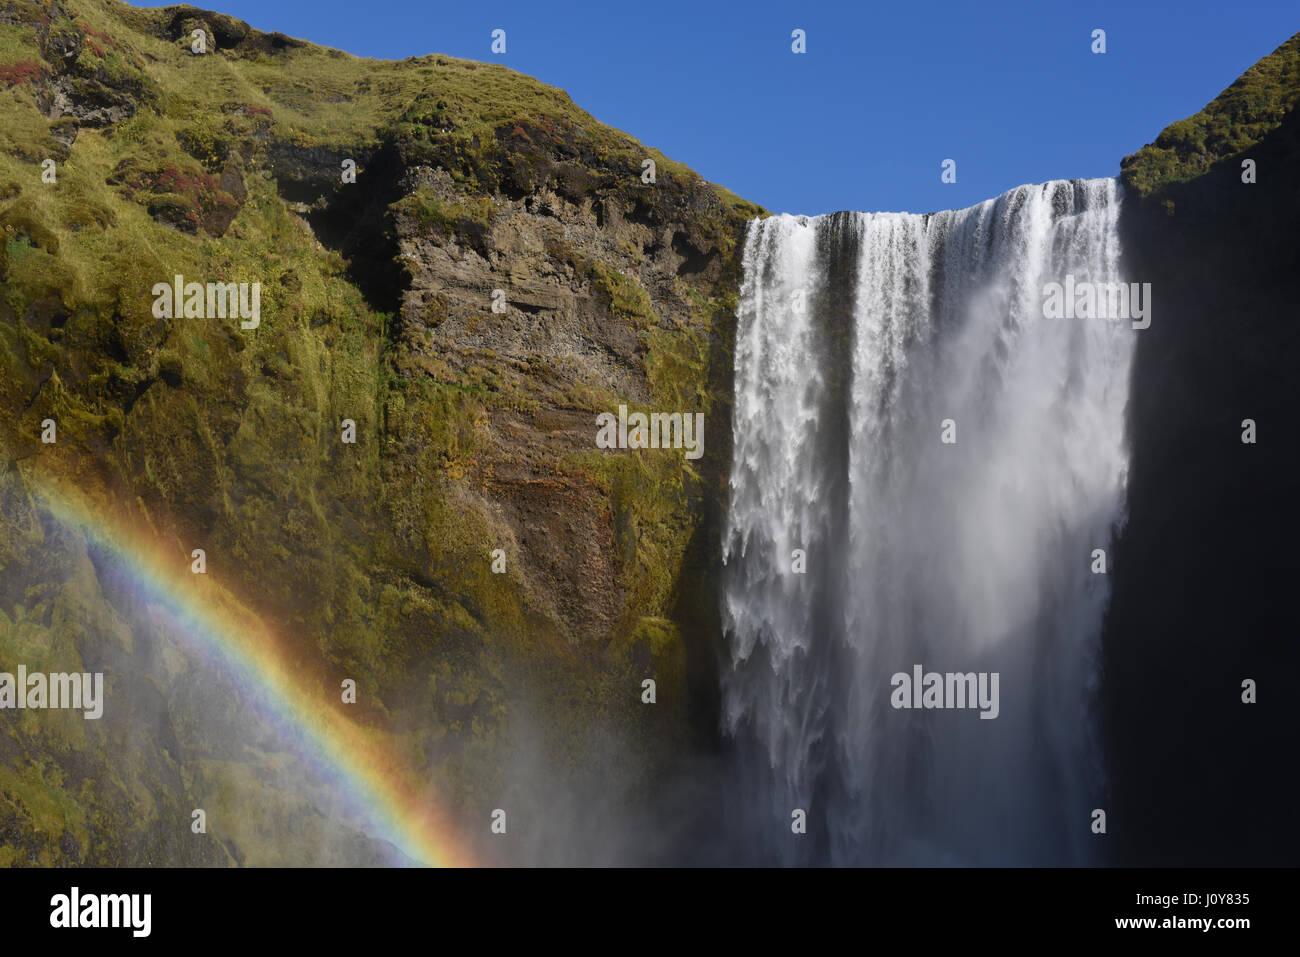 Skogafoss Waterfall and rainbow, Skogar, South Iceland - Stock Image